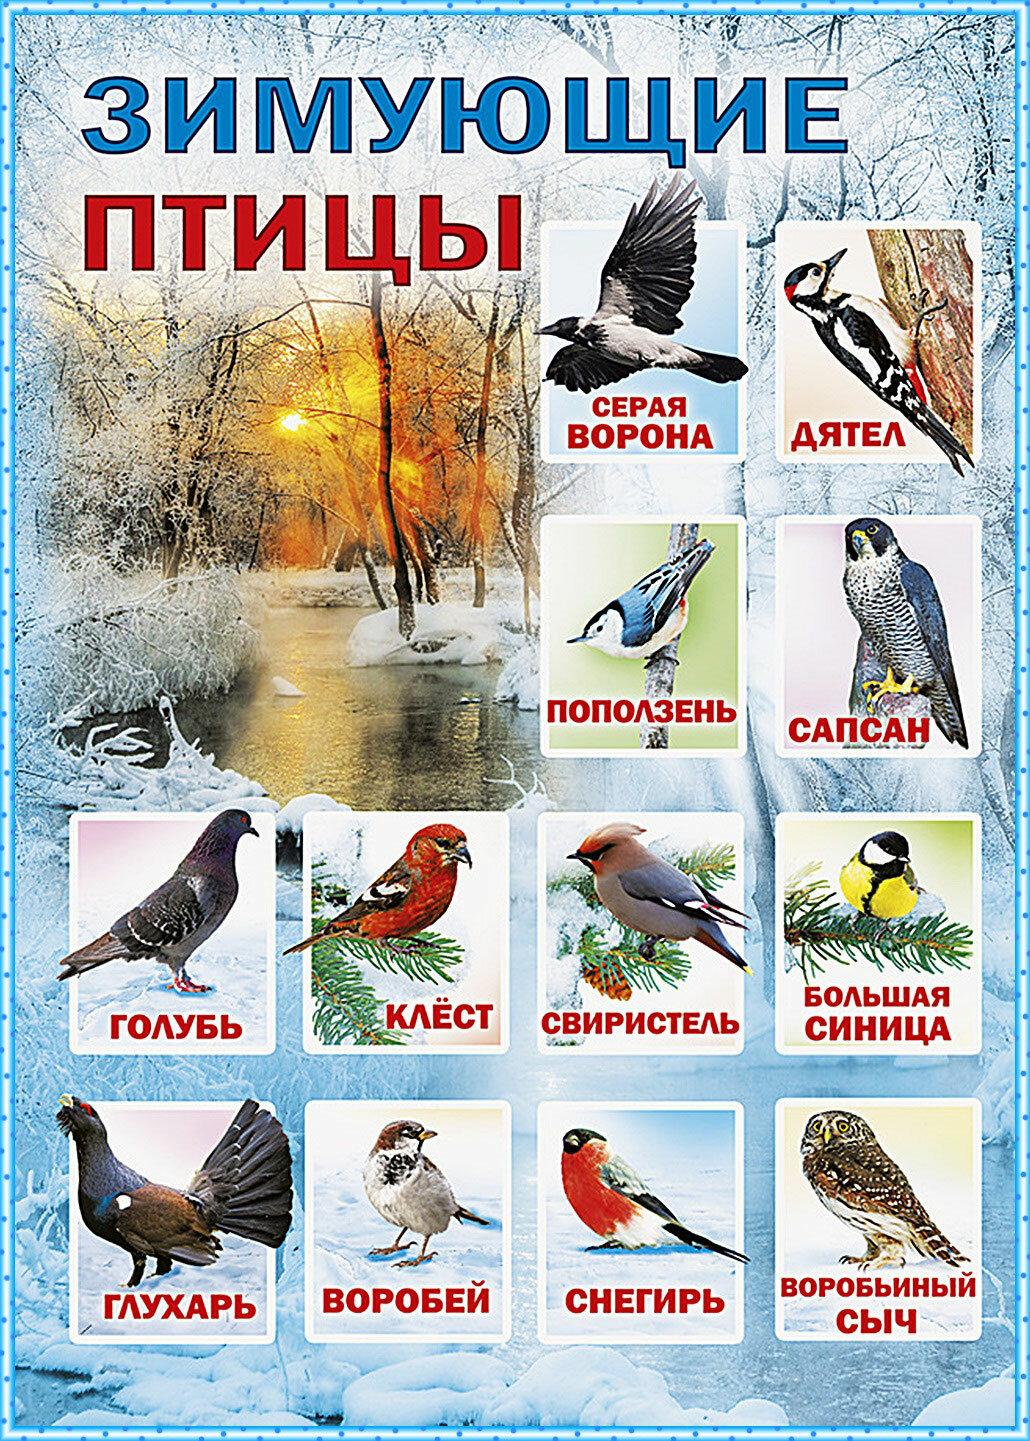 Картинки птиц сибири для детей